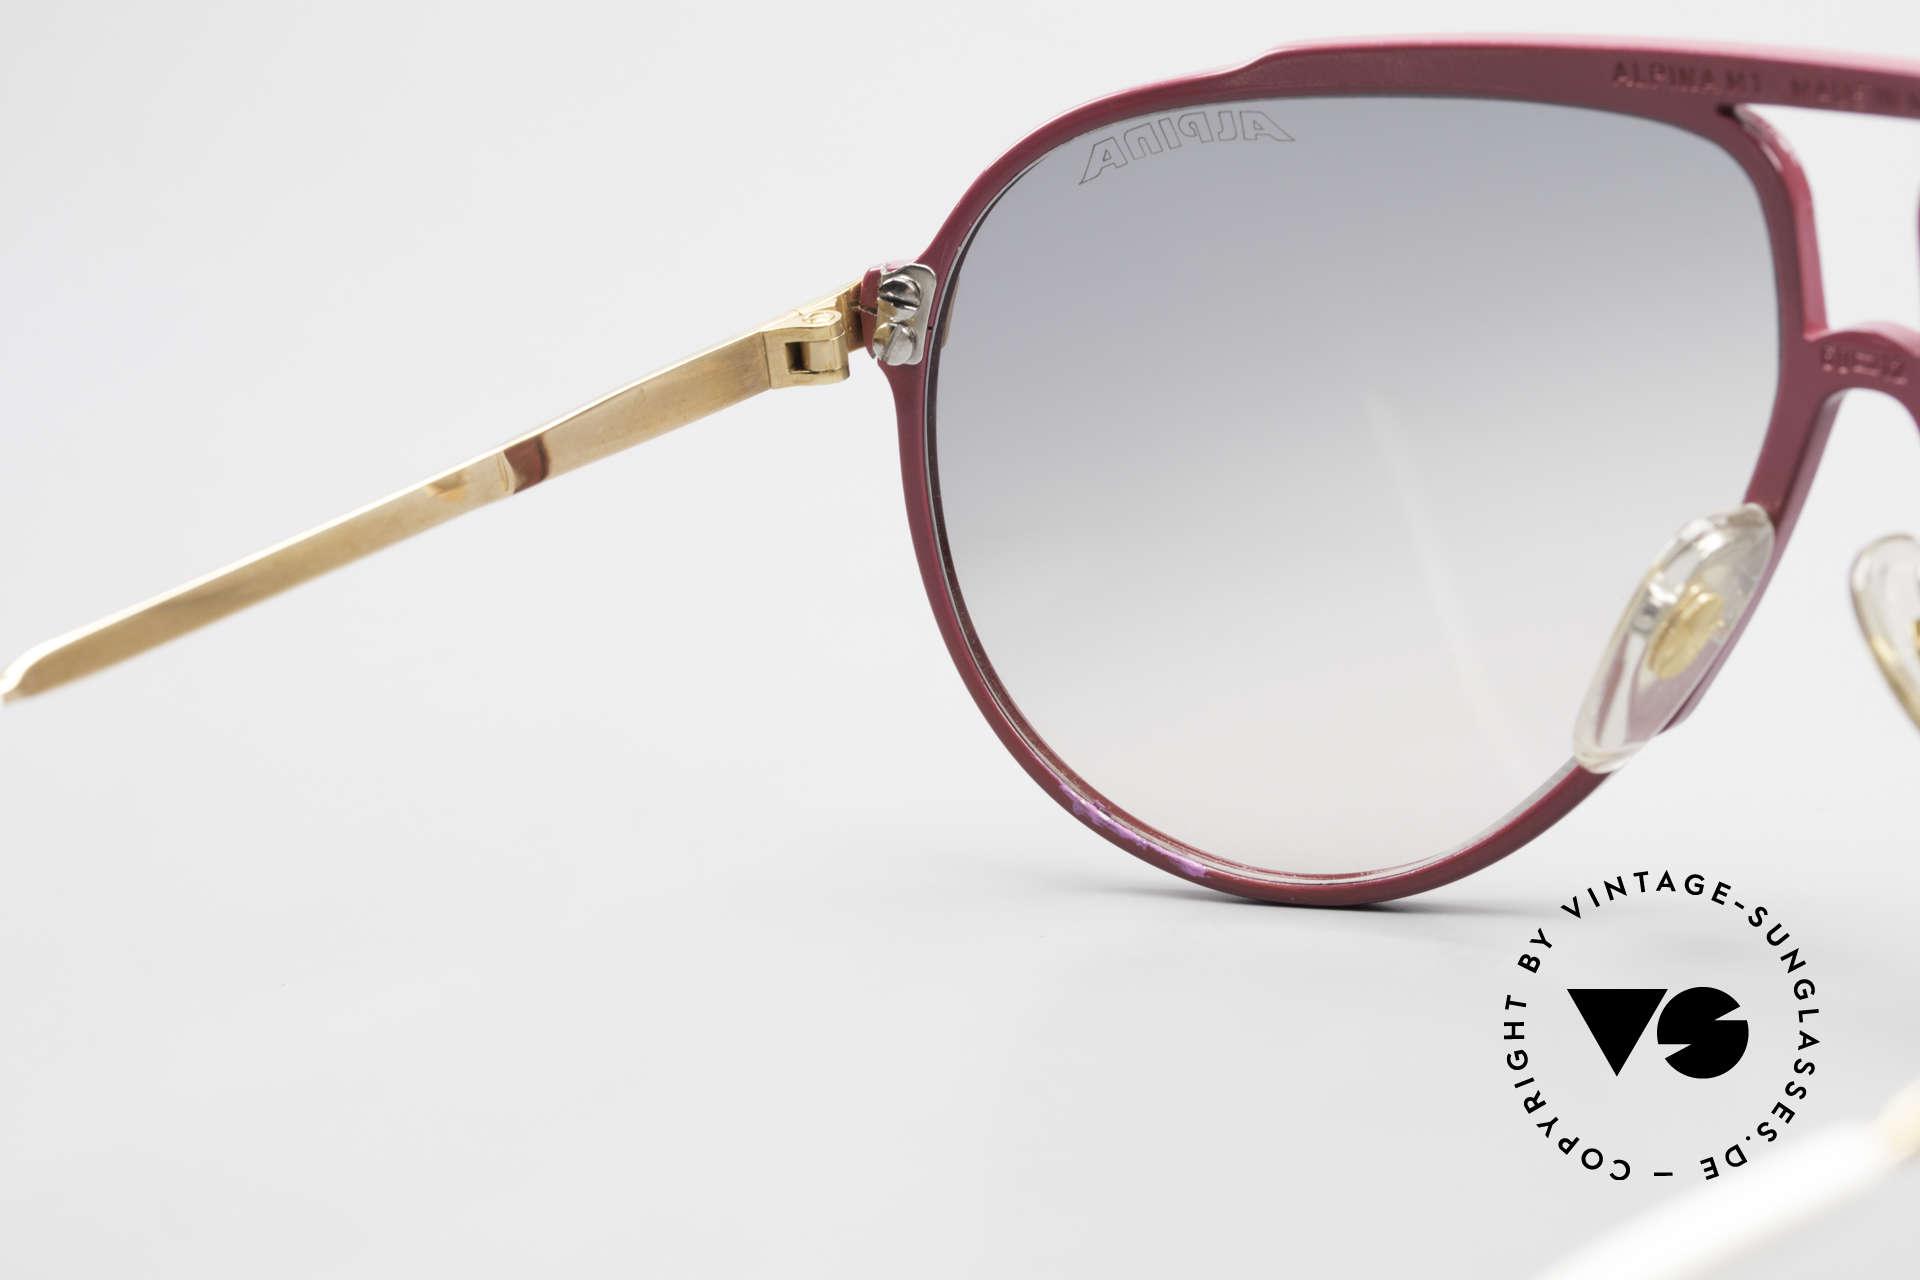 Alpina M1 Iconic Vintage Sunglasses 80s, Size: medium, Made for Women